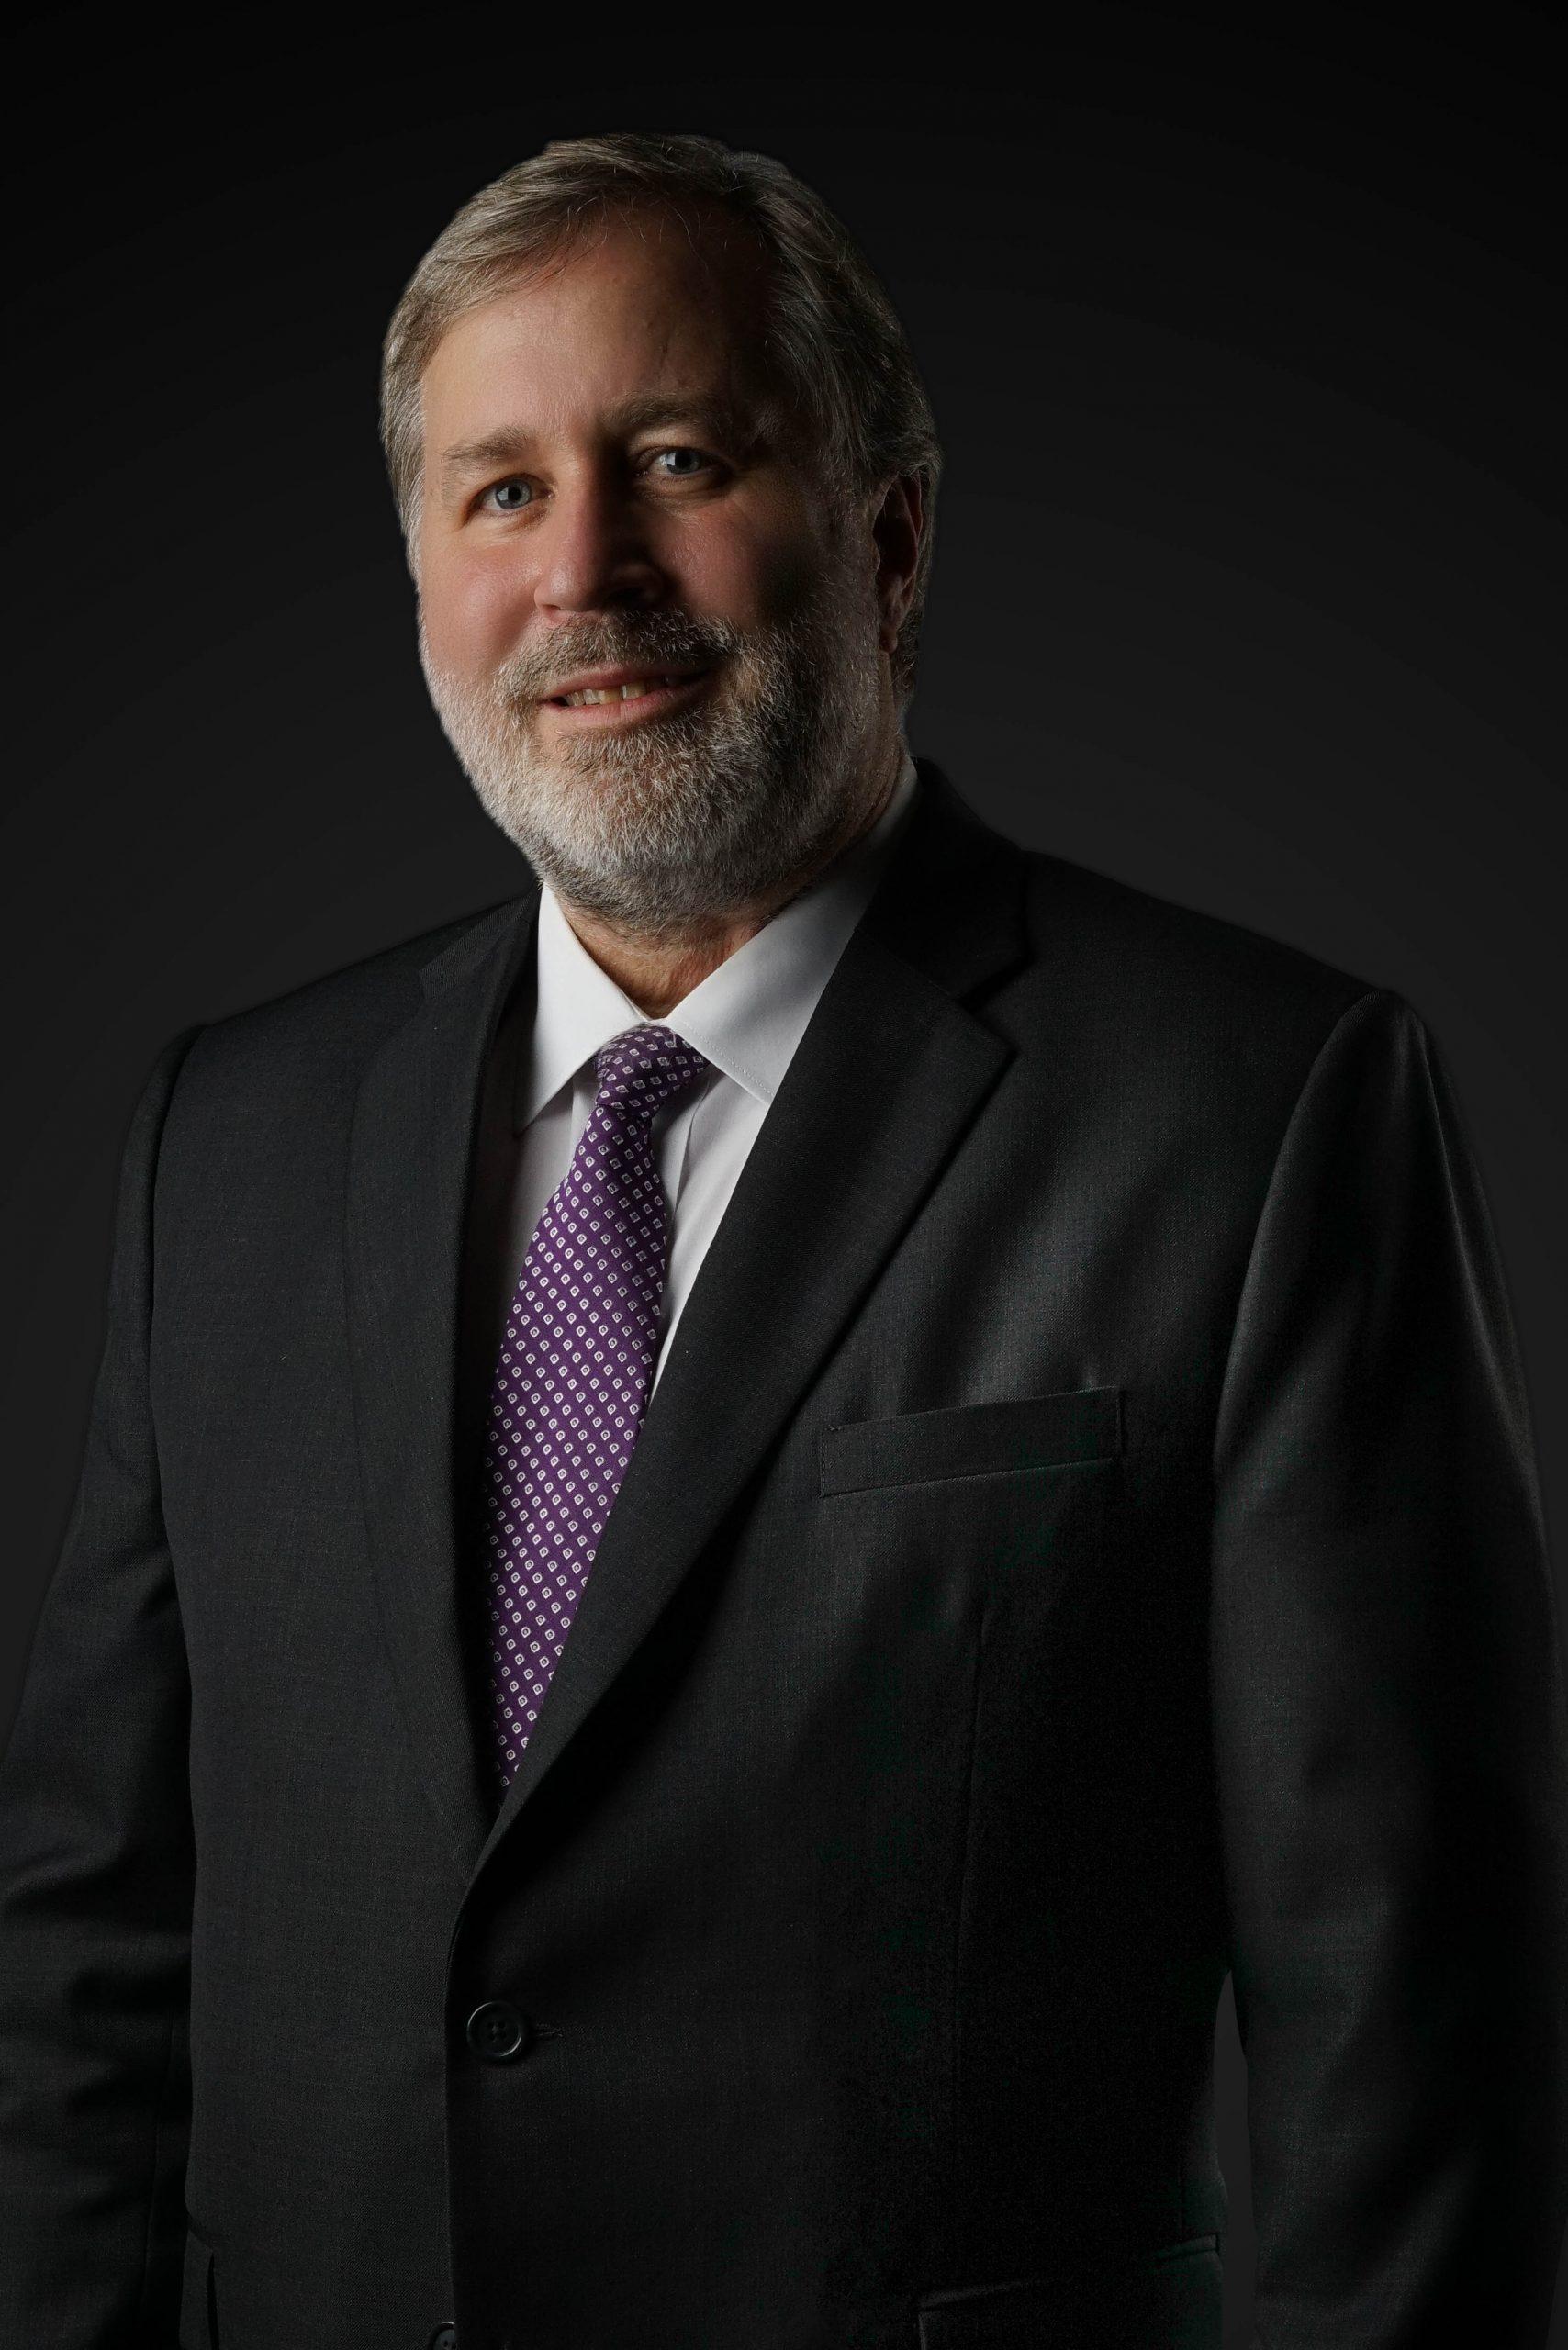 Prof Ian Bofinger